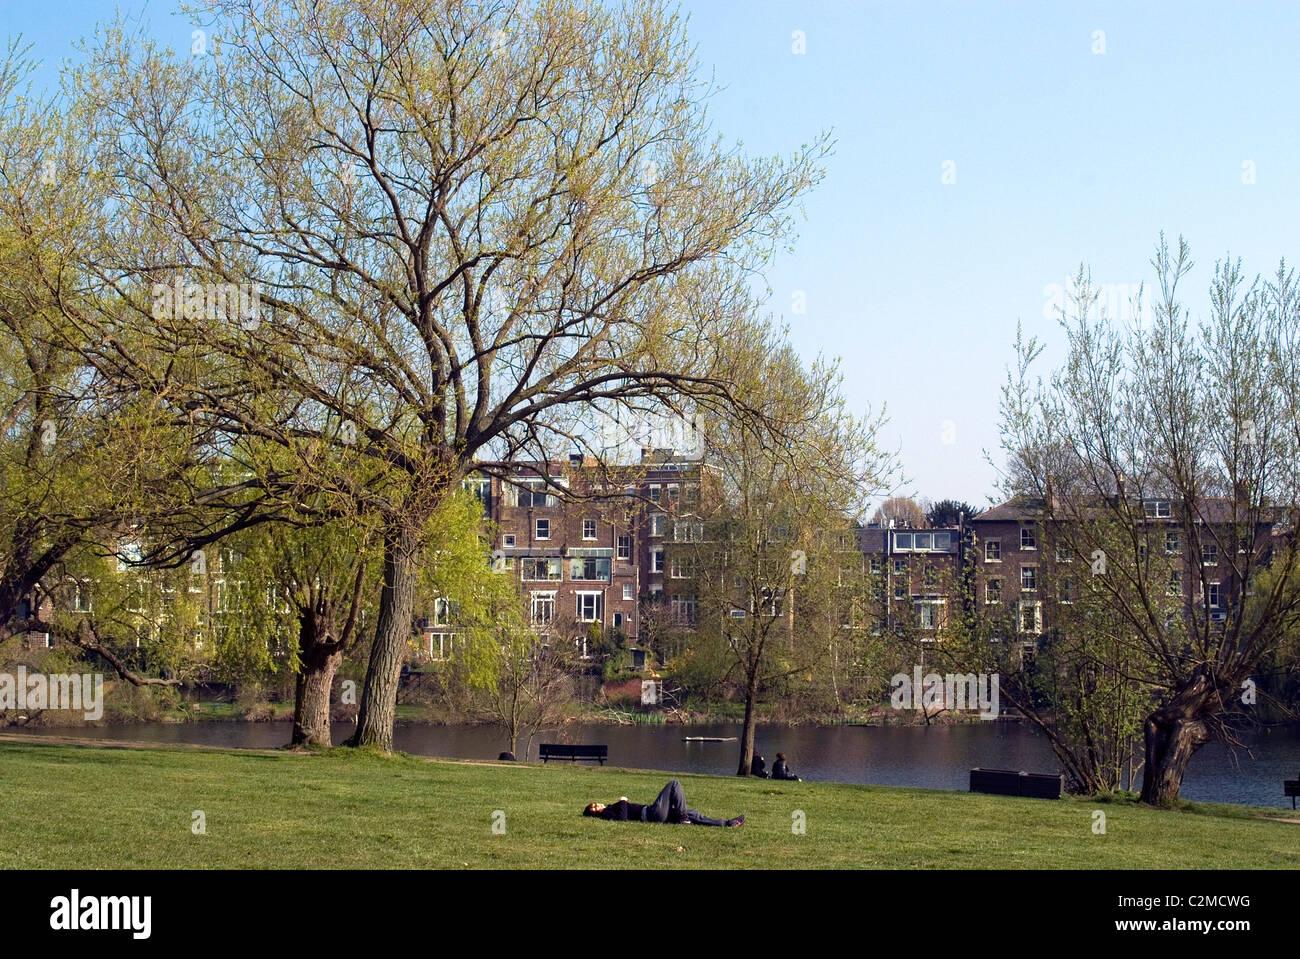 One of the Highgate Ponds, Hampstead Heath, London - Stock Image